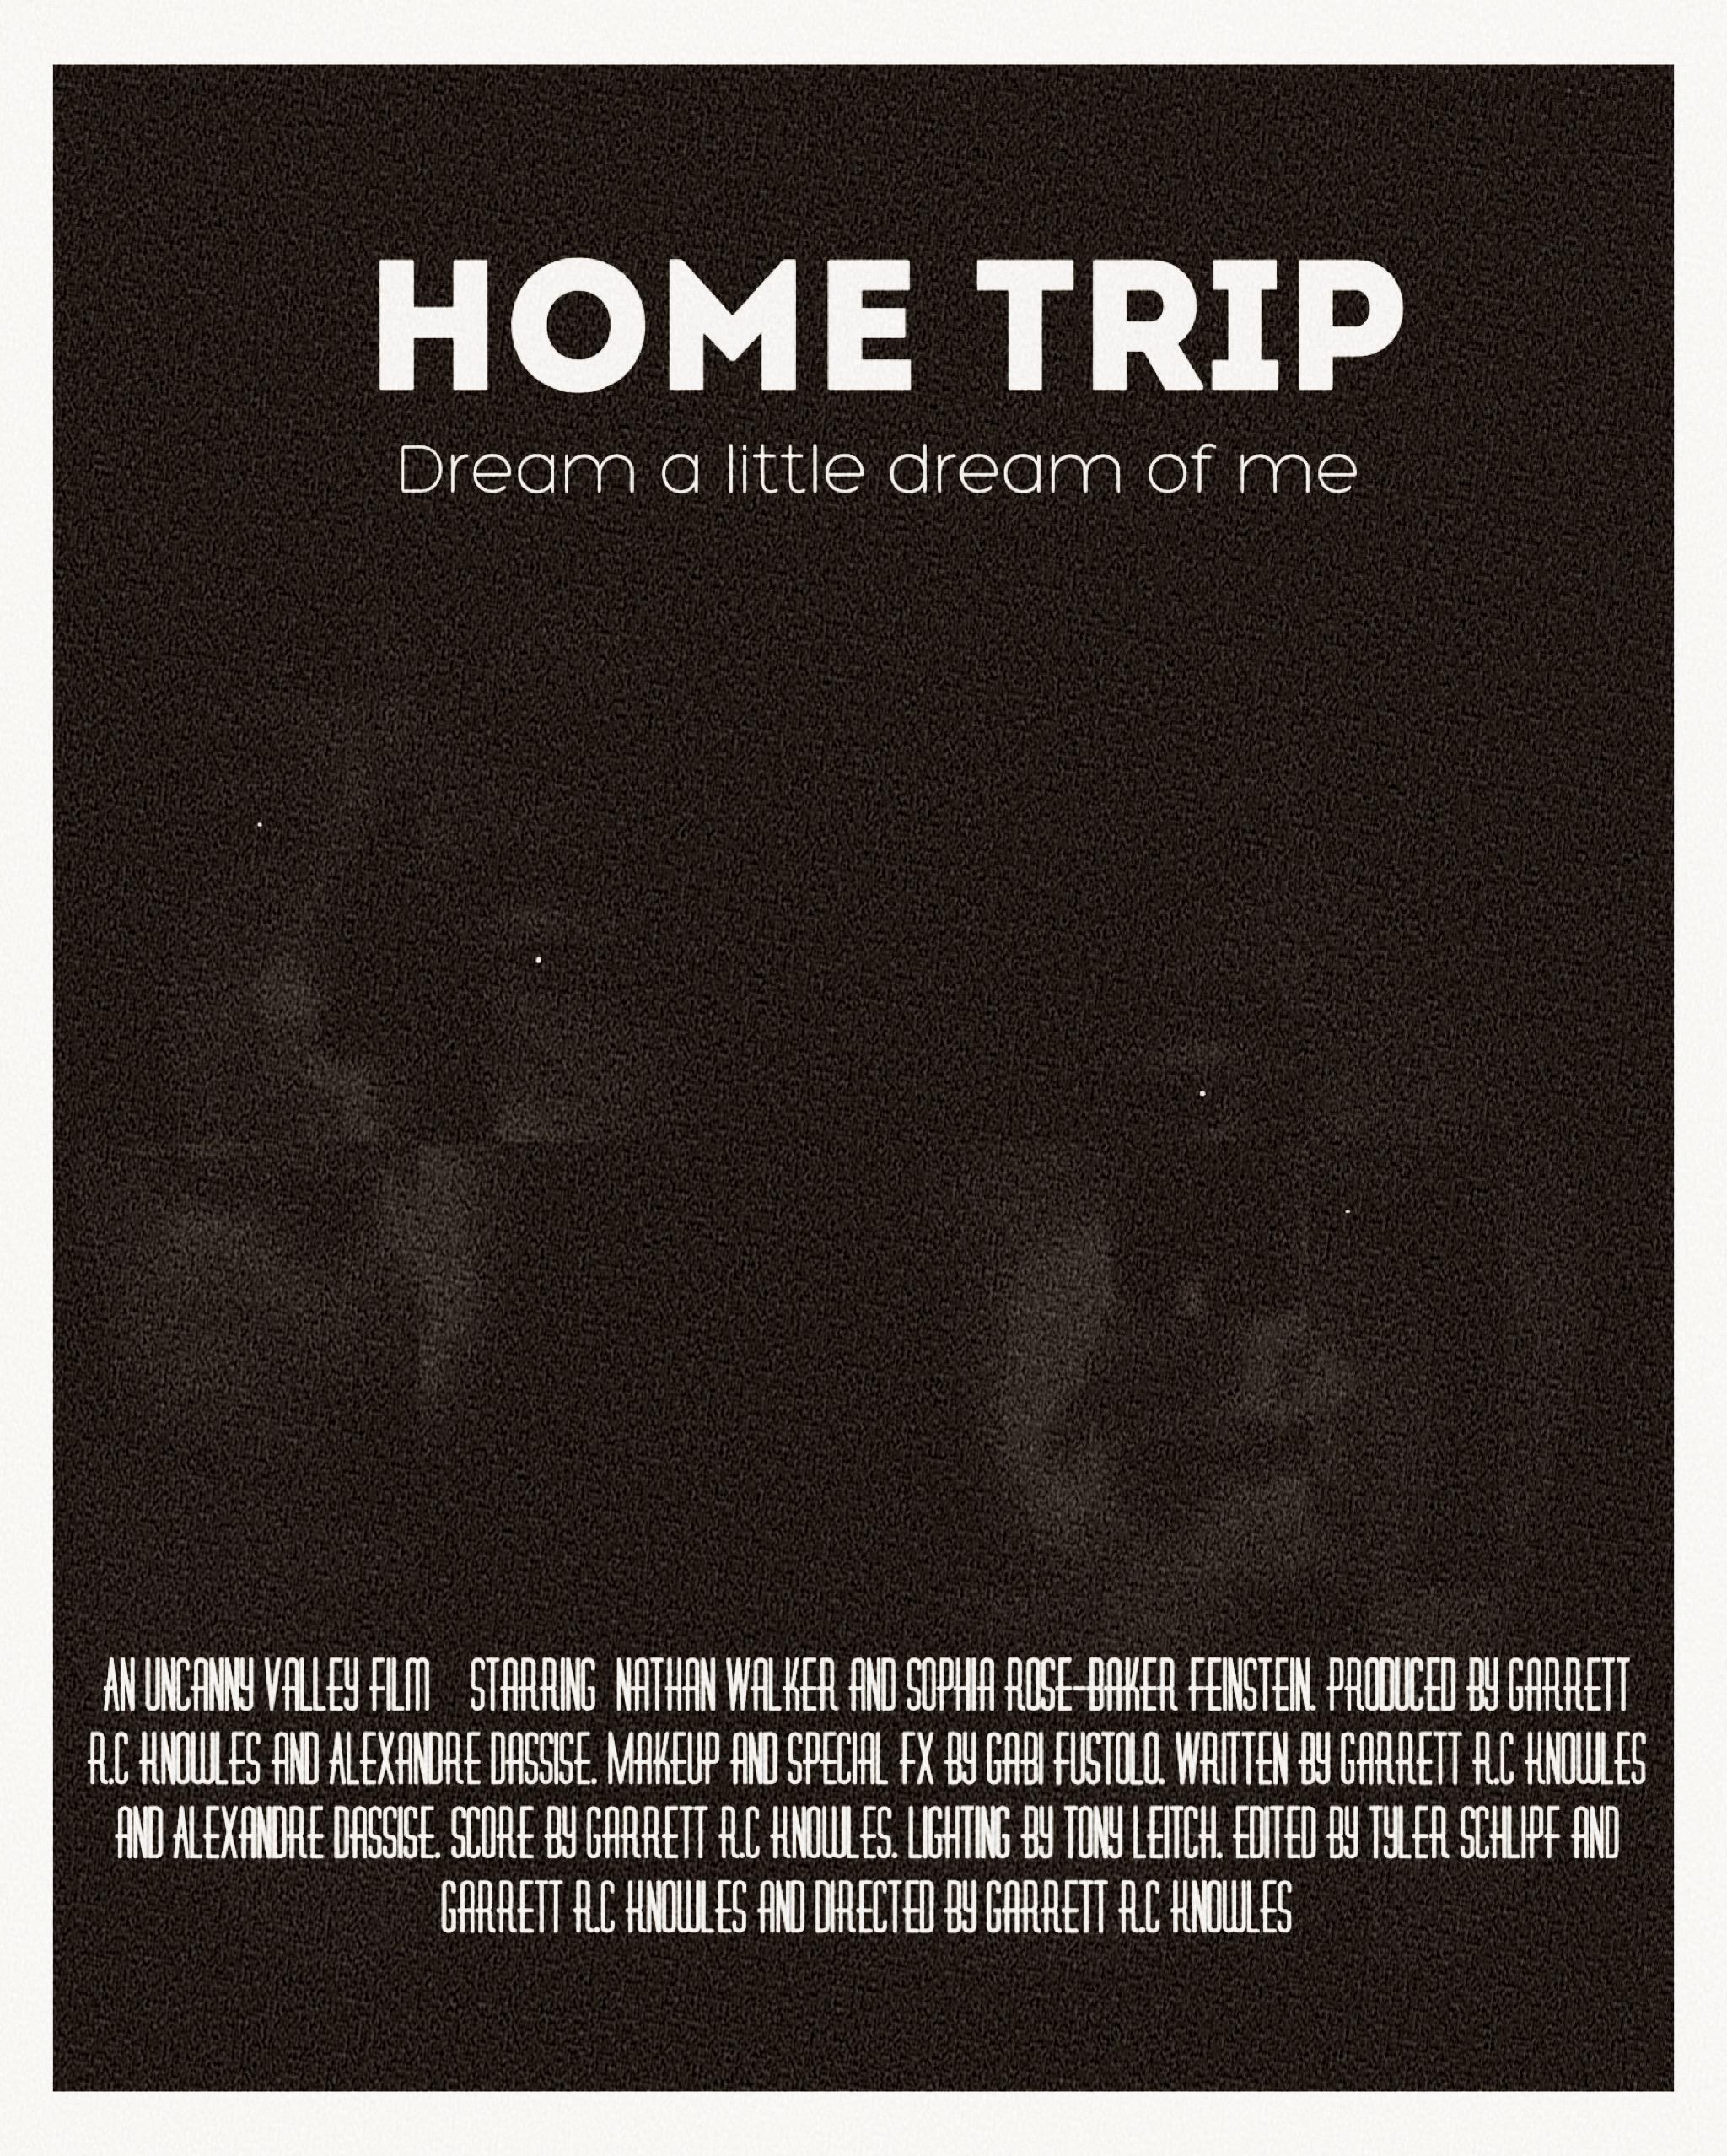 home trip uncanny valley films